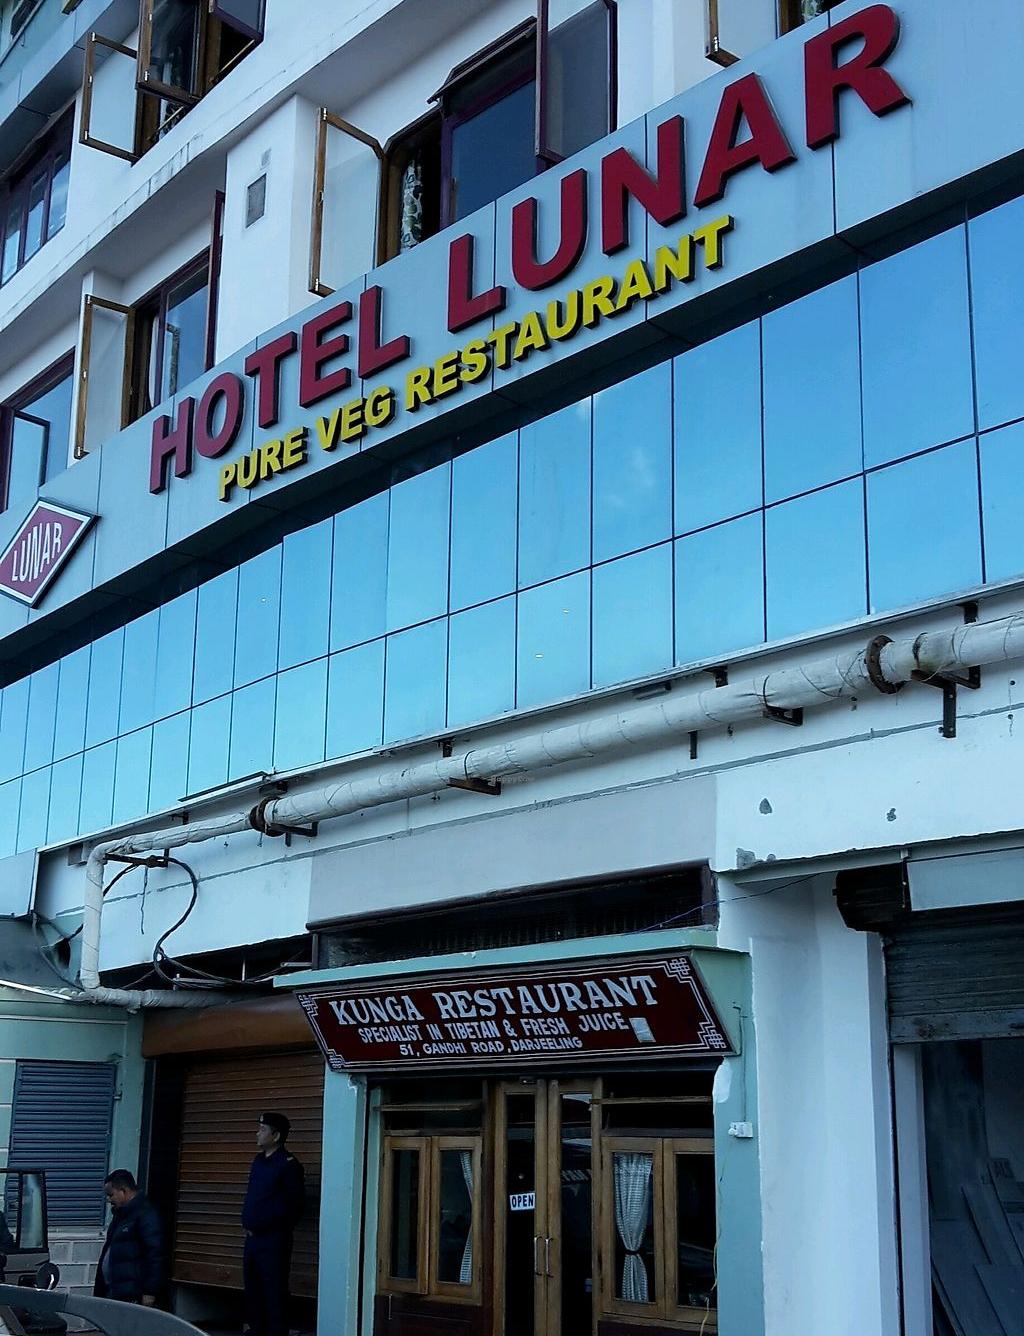 Top Restaurant In Darjeeling Every Food-Lover Must Try - Lunar Restaurant